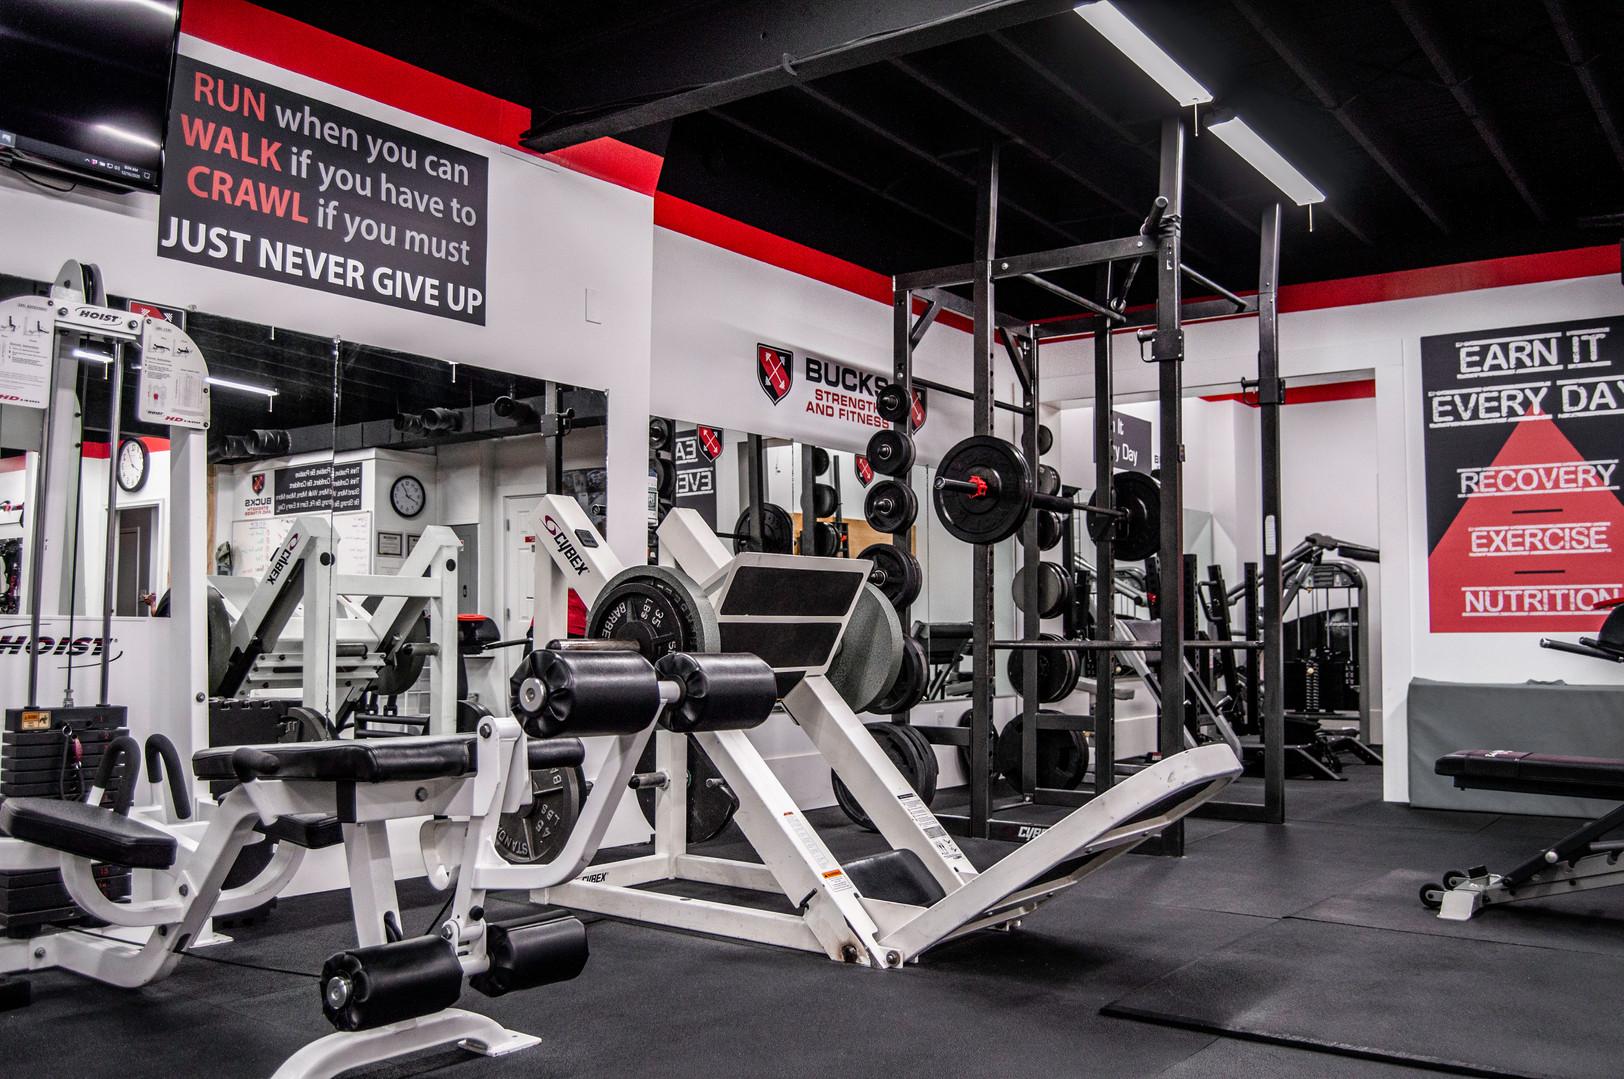 interior-bucks-strength-fitness-2.jpg